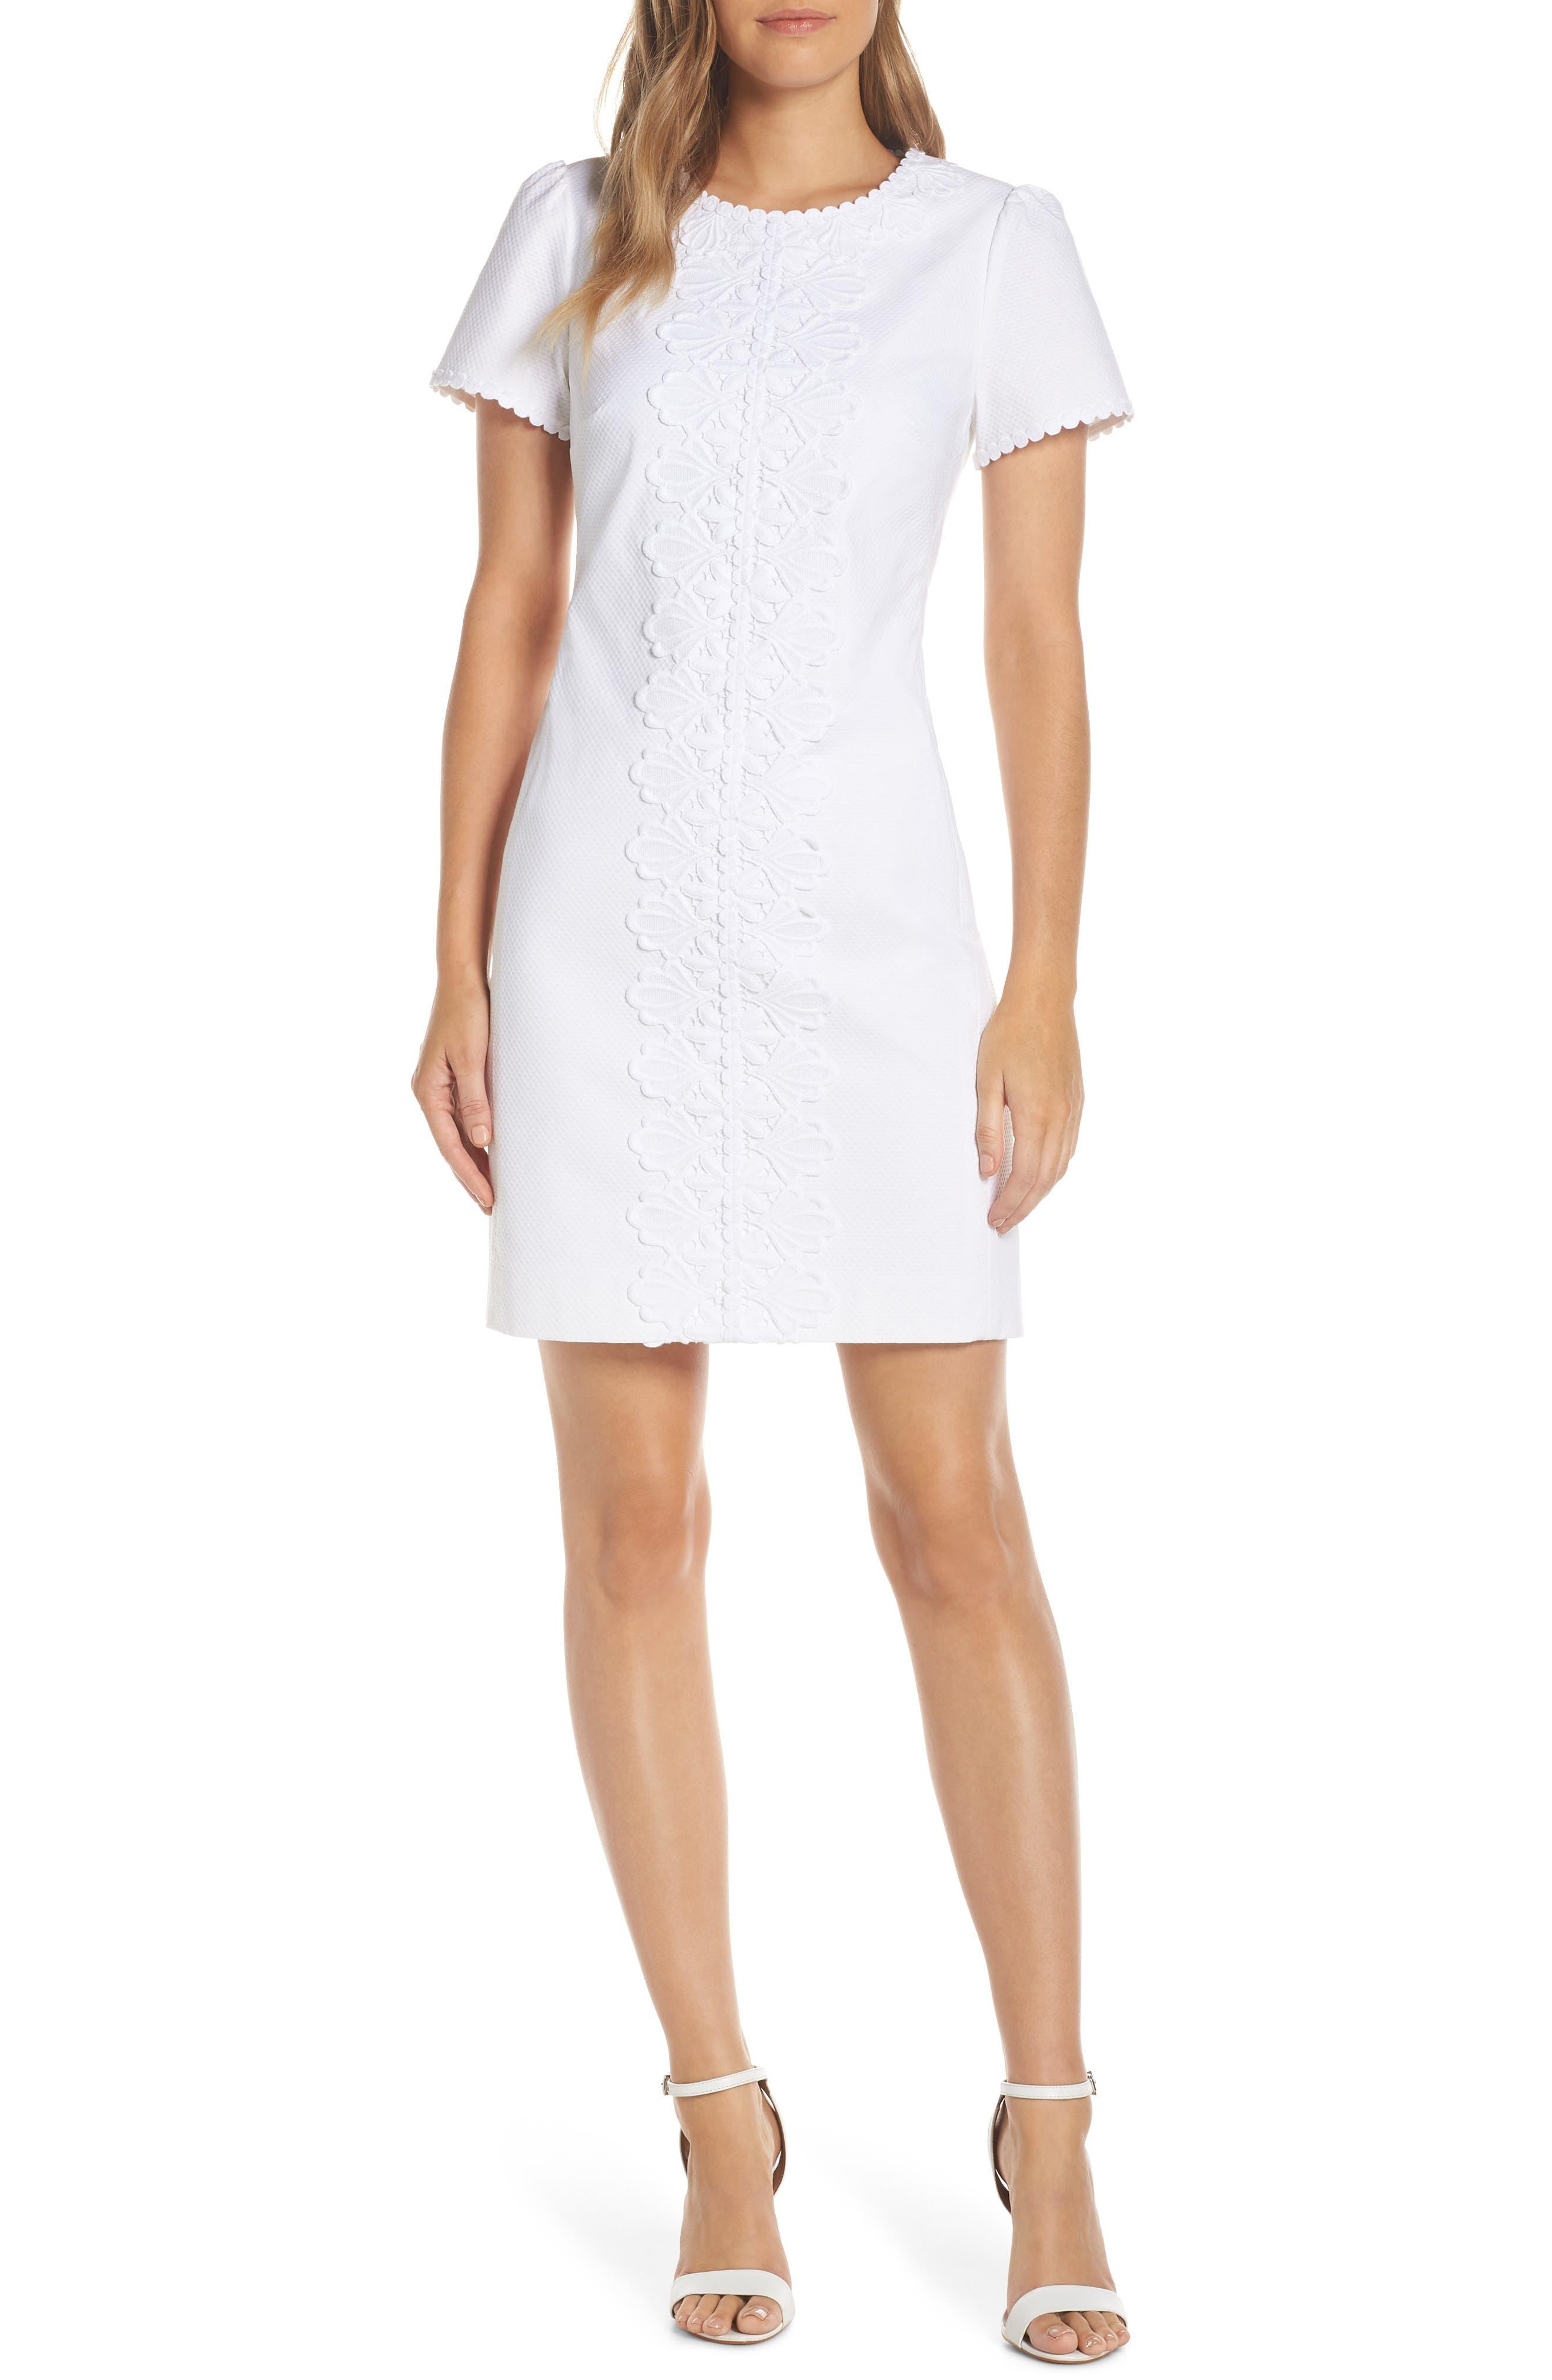 Lilly Pulitzer Maisie Stretch Pique Sheath Dress, White